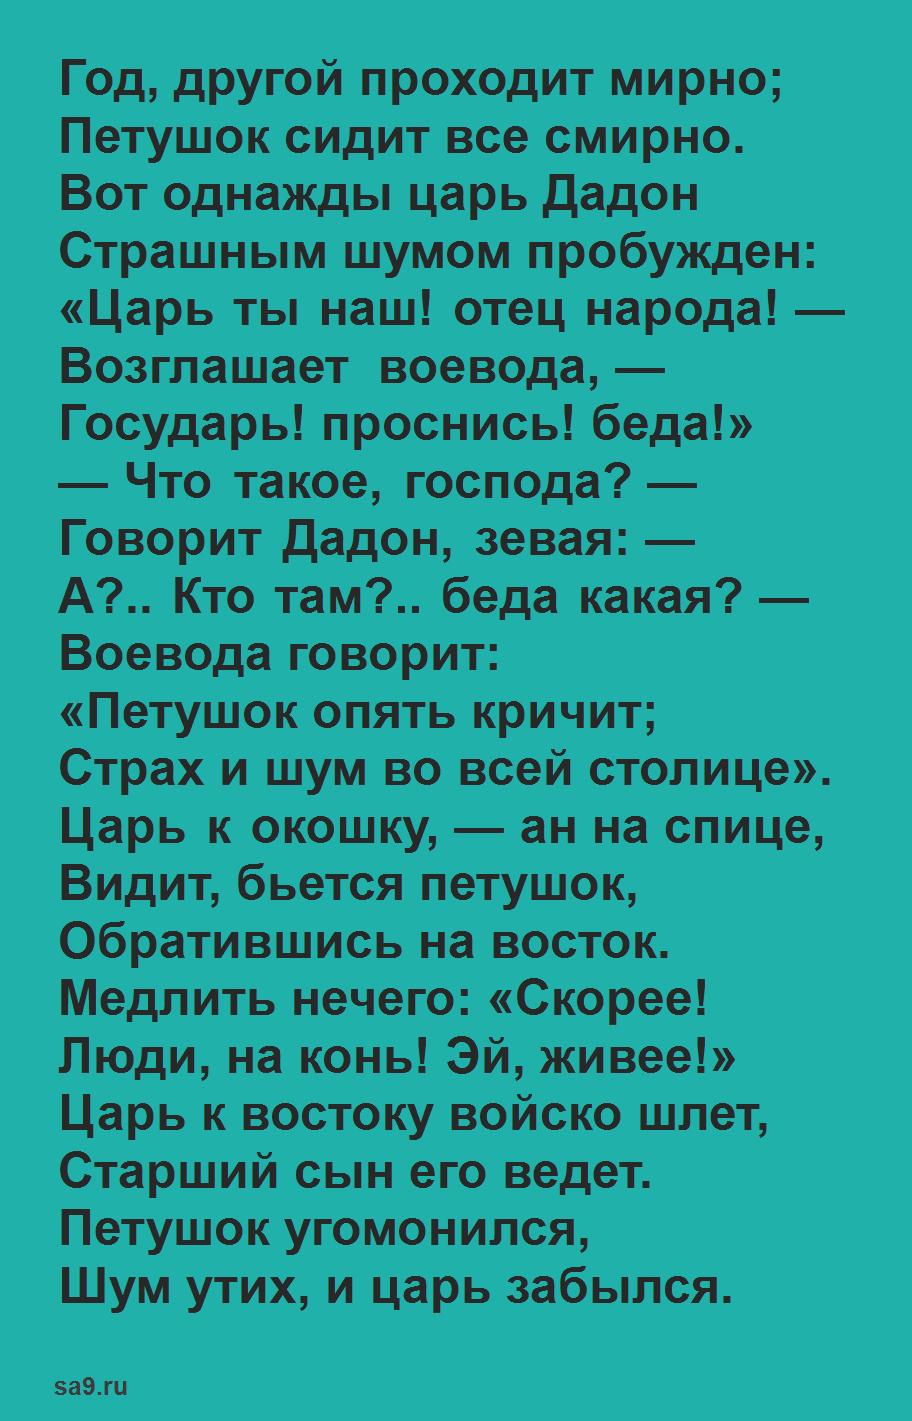 Читать сказку Пушкина 'О золотом петушке'